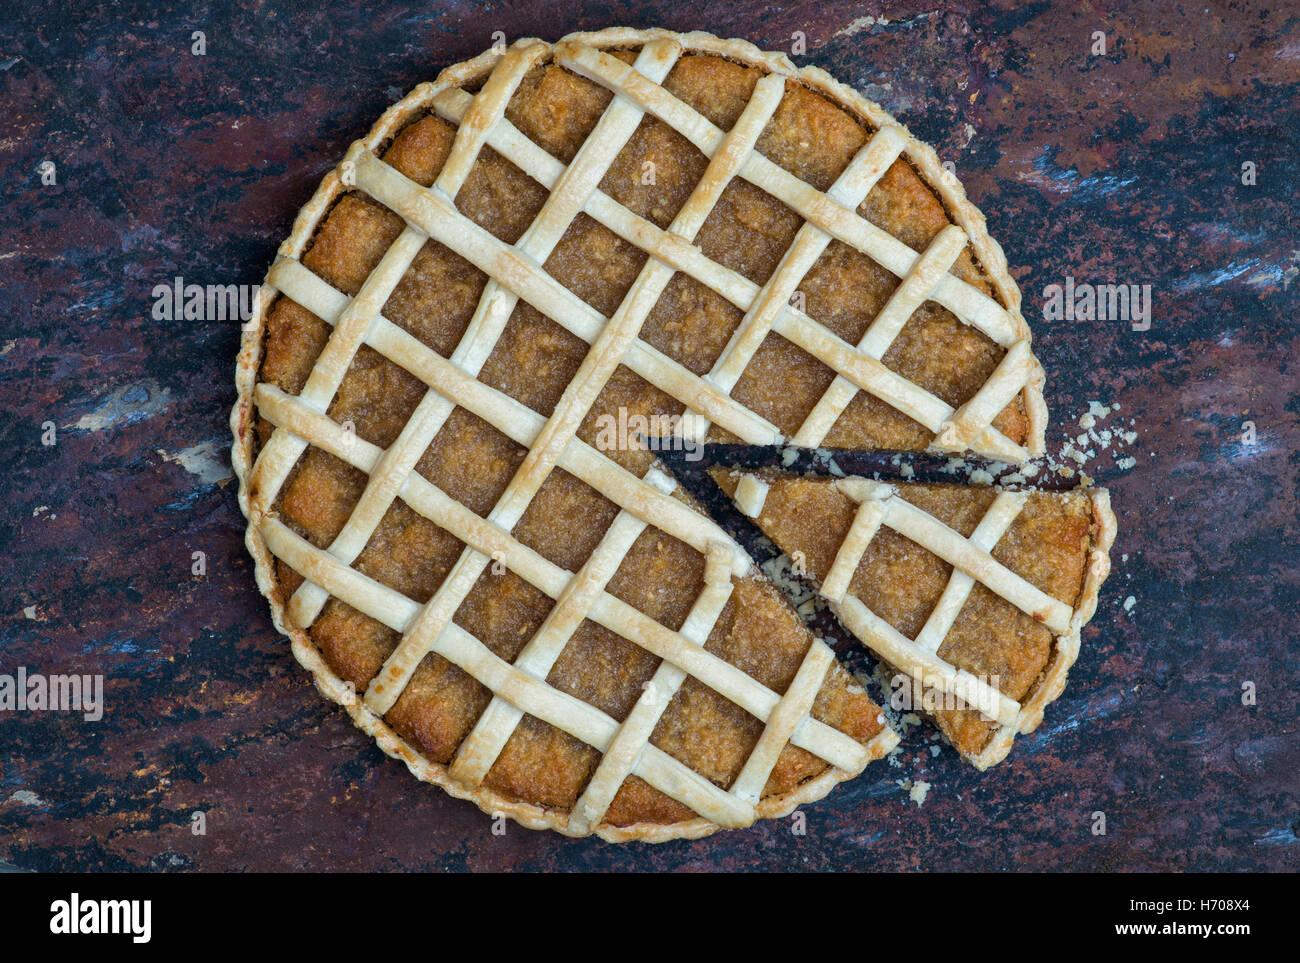 Homemade Treacle Tart on slate - Stock Image